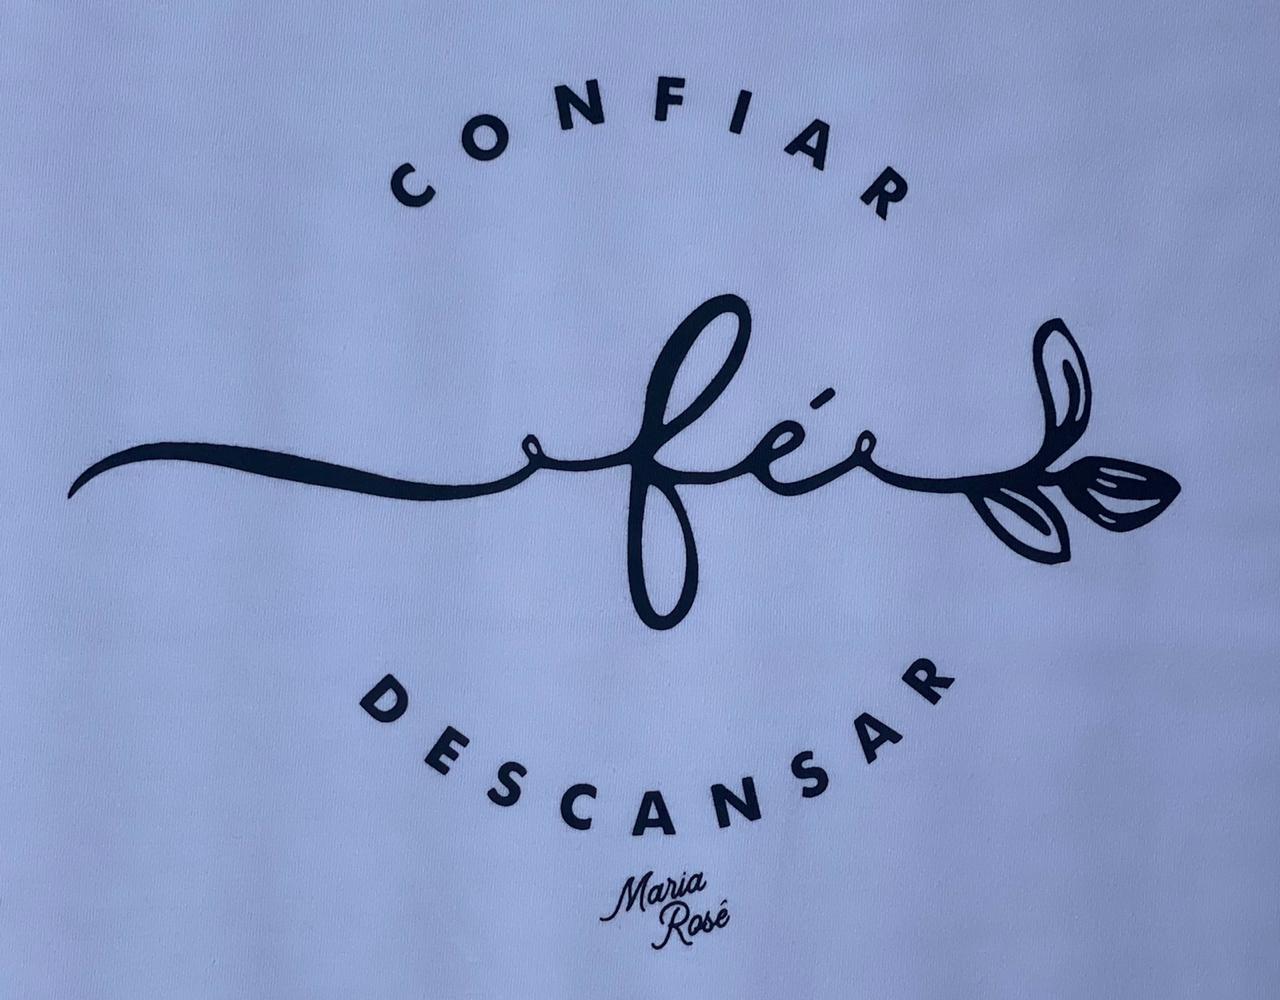 T-SHIRT FÉ/CONFIAR/DESCANSAR - MARIA ROSÊ